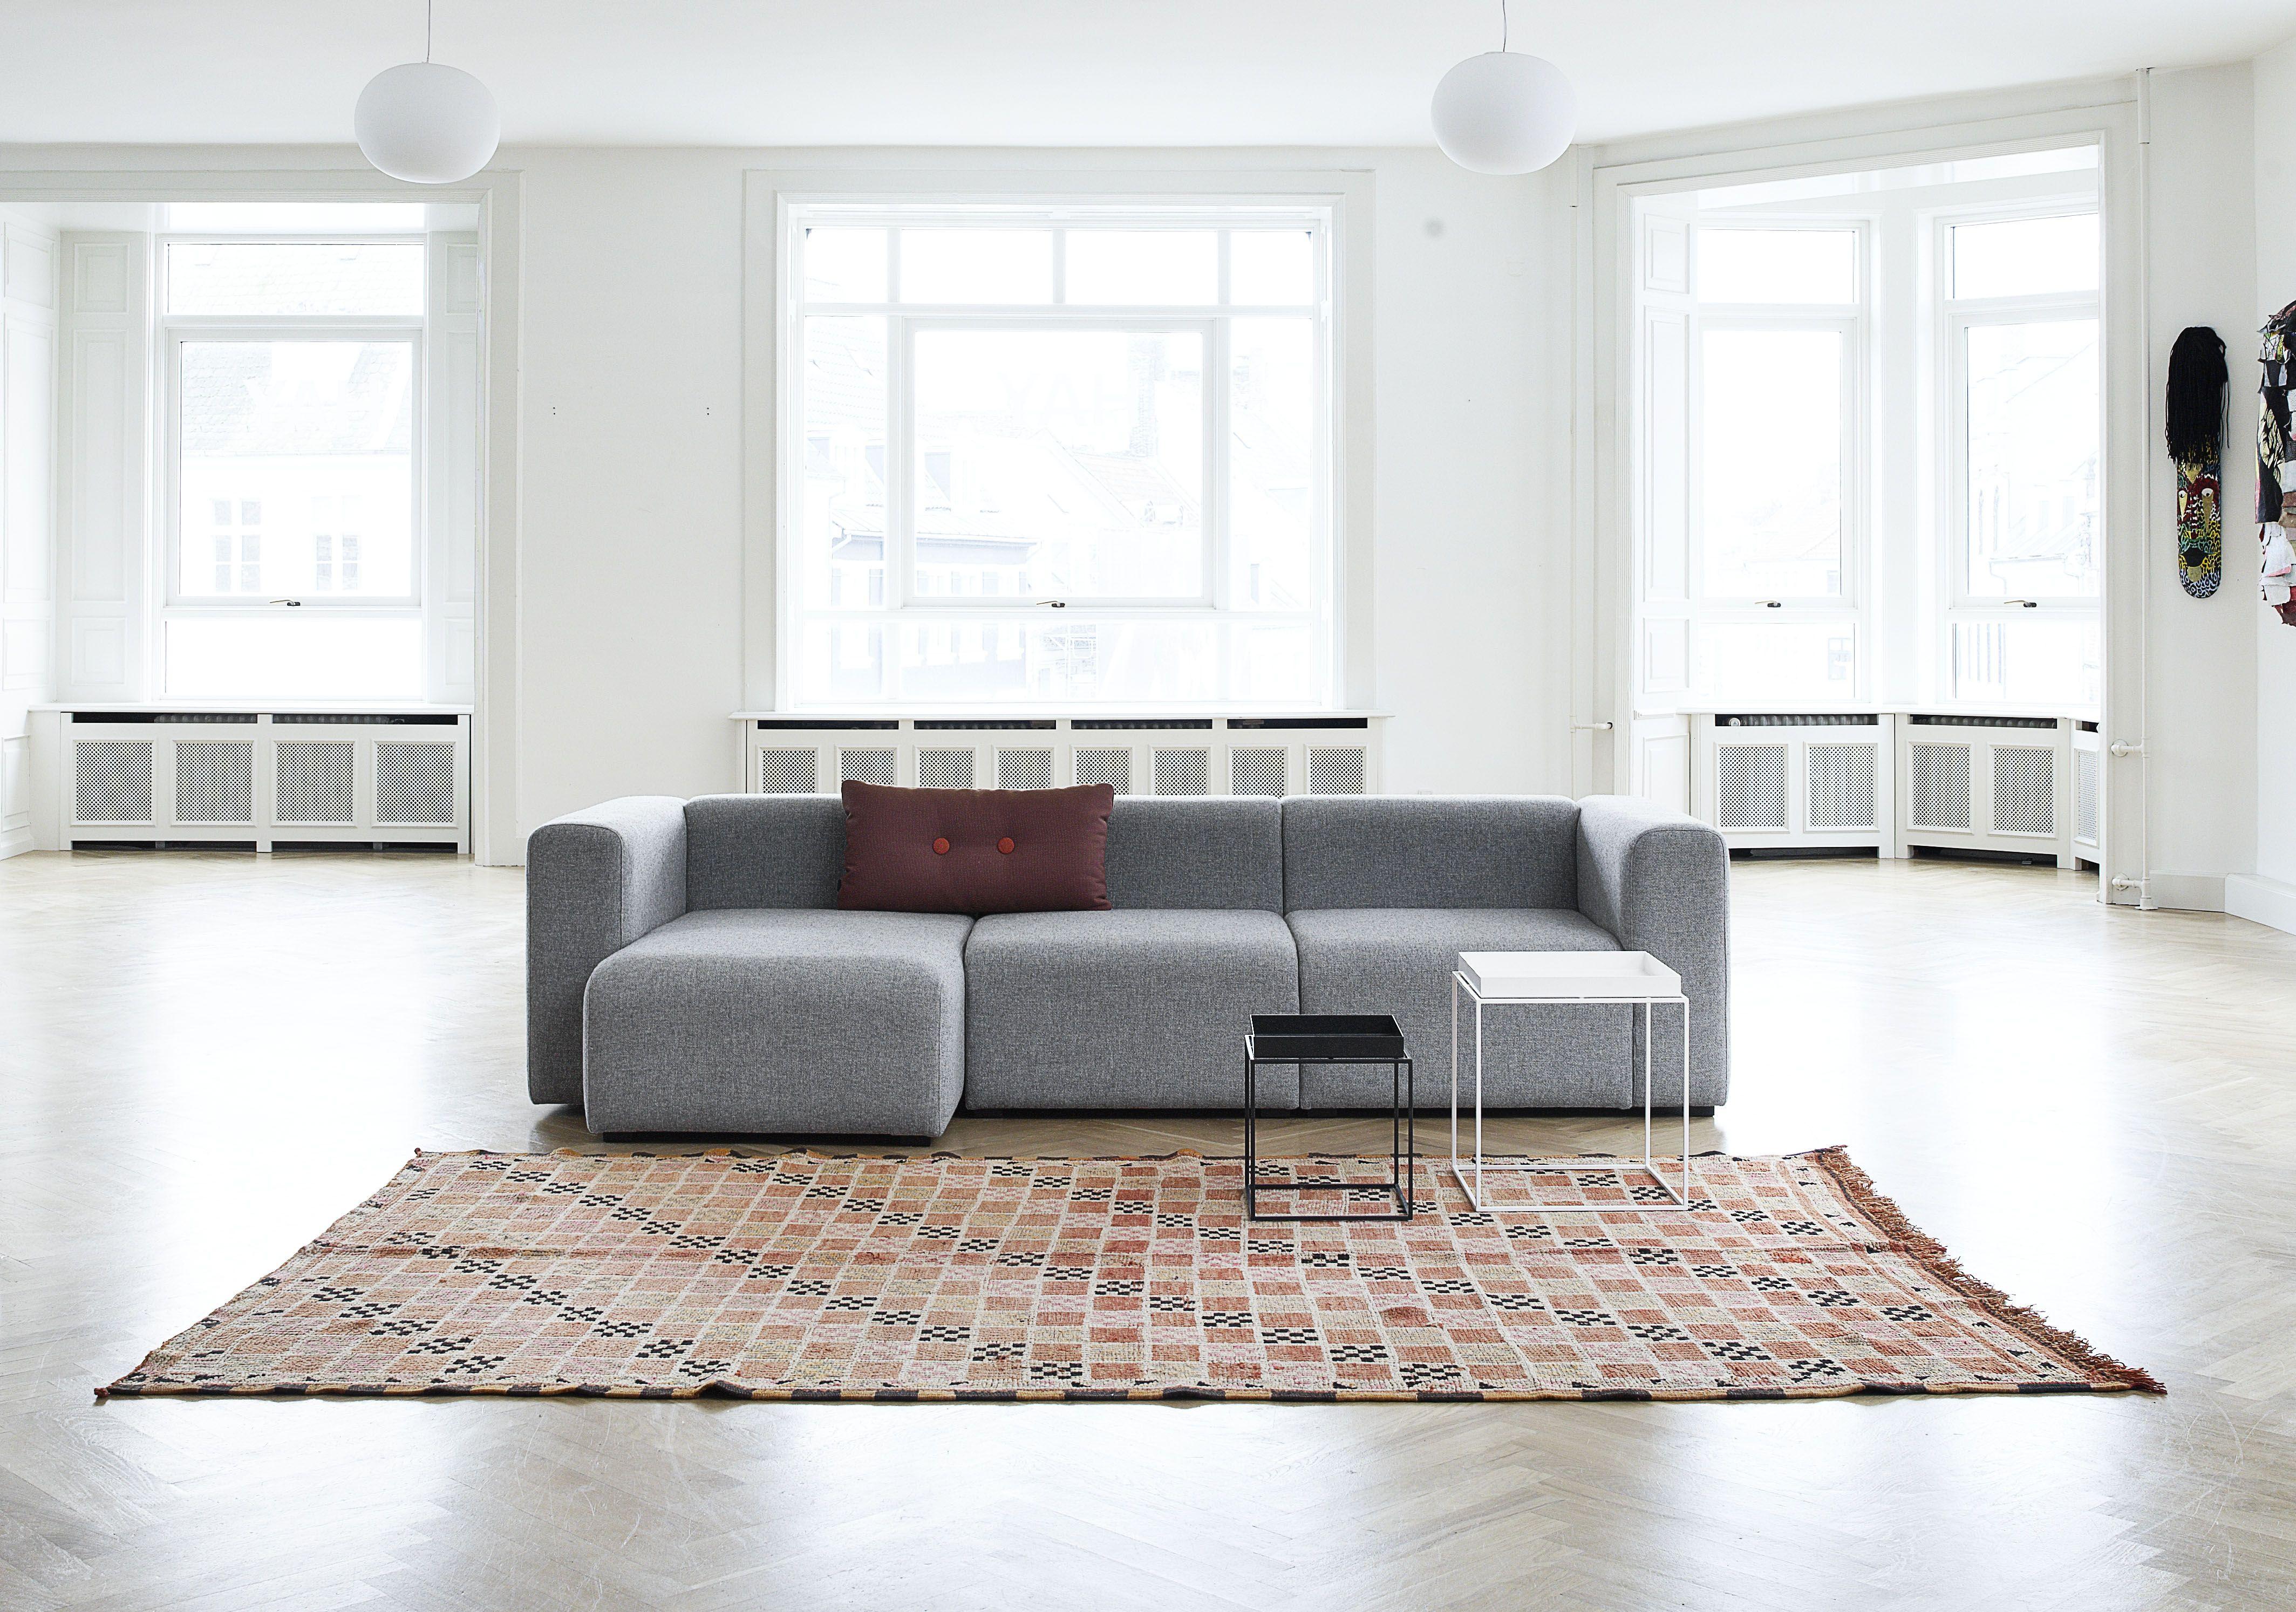 Hay Sofa Kvadrat Pier 1 Carmen Reviews Mags Dressed In Hallingdal 130 Textiles And Space